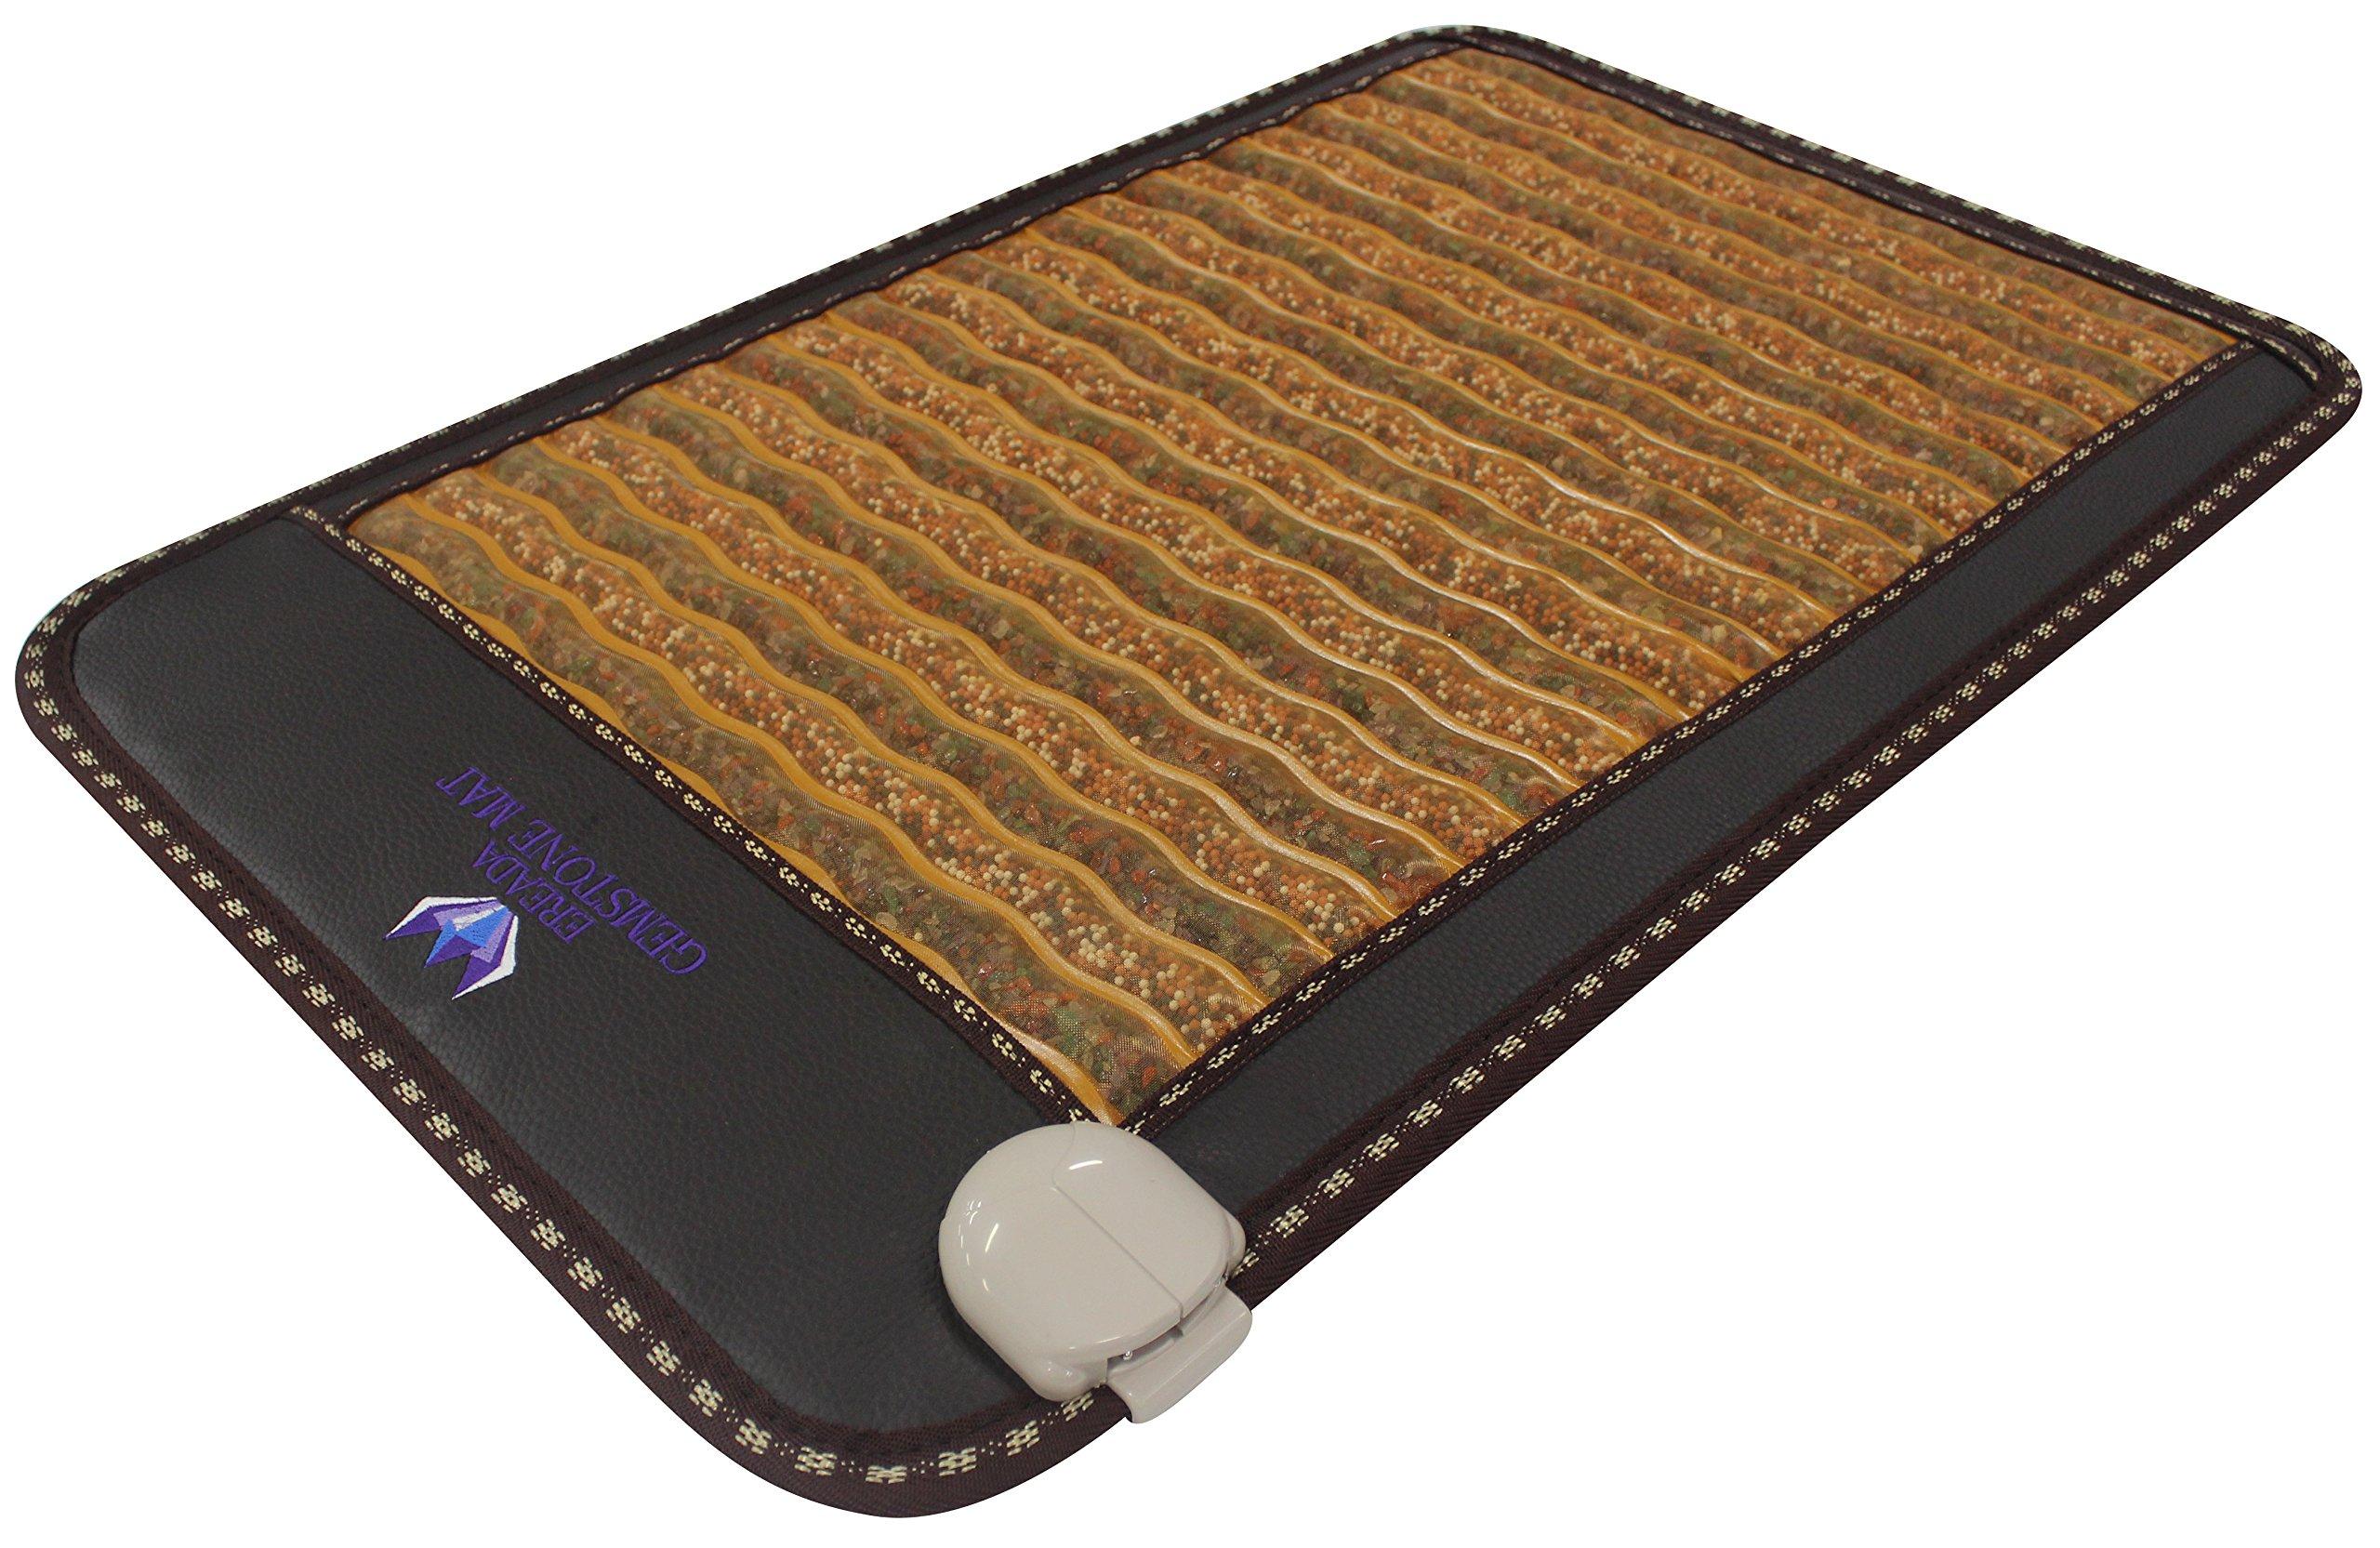 "Far Infra-Red Gemstone Mini Mat 31''L x 20""W - Made in Korea - Amethyst - Agate - Chalcedony - Garnet - Tourmaline - FIR Heating Pad - Negative Ion - Bio Magnetic Therapy - FDA Registered Manufacturer"